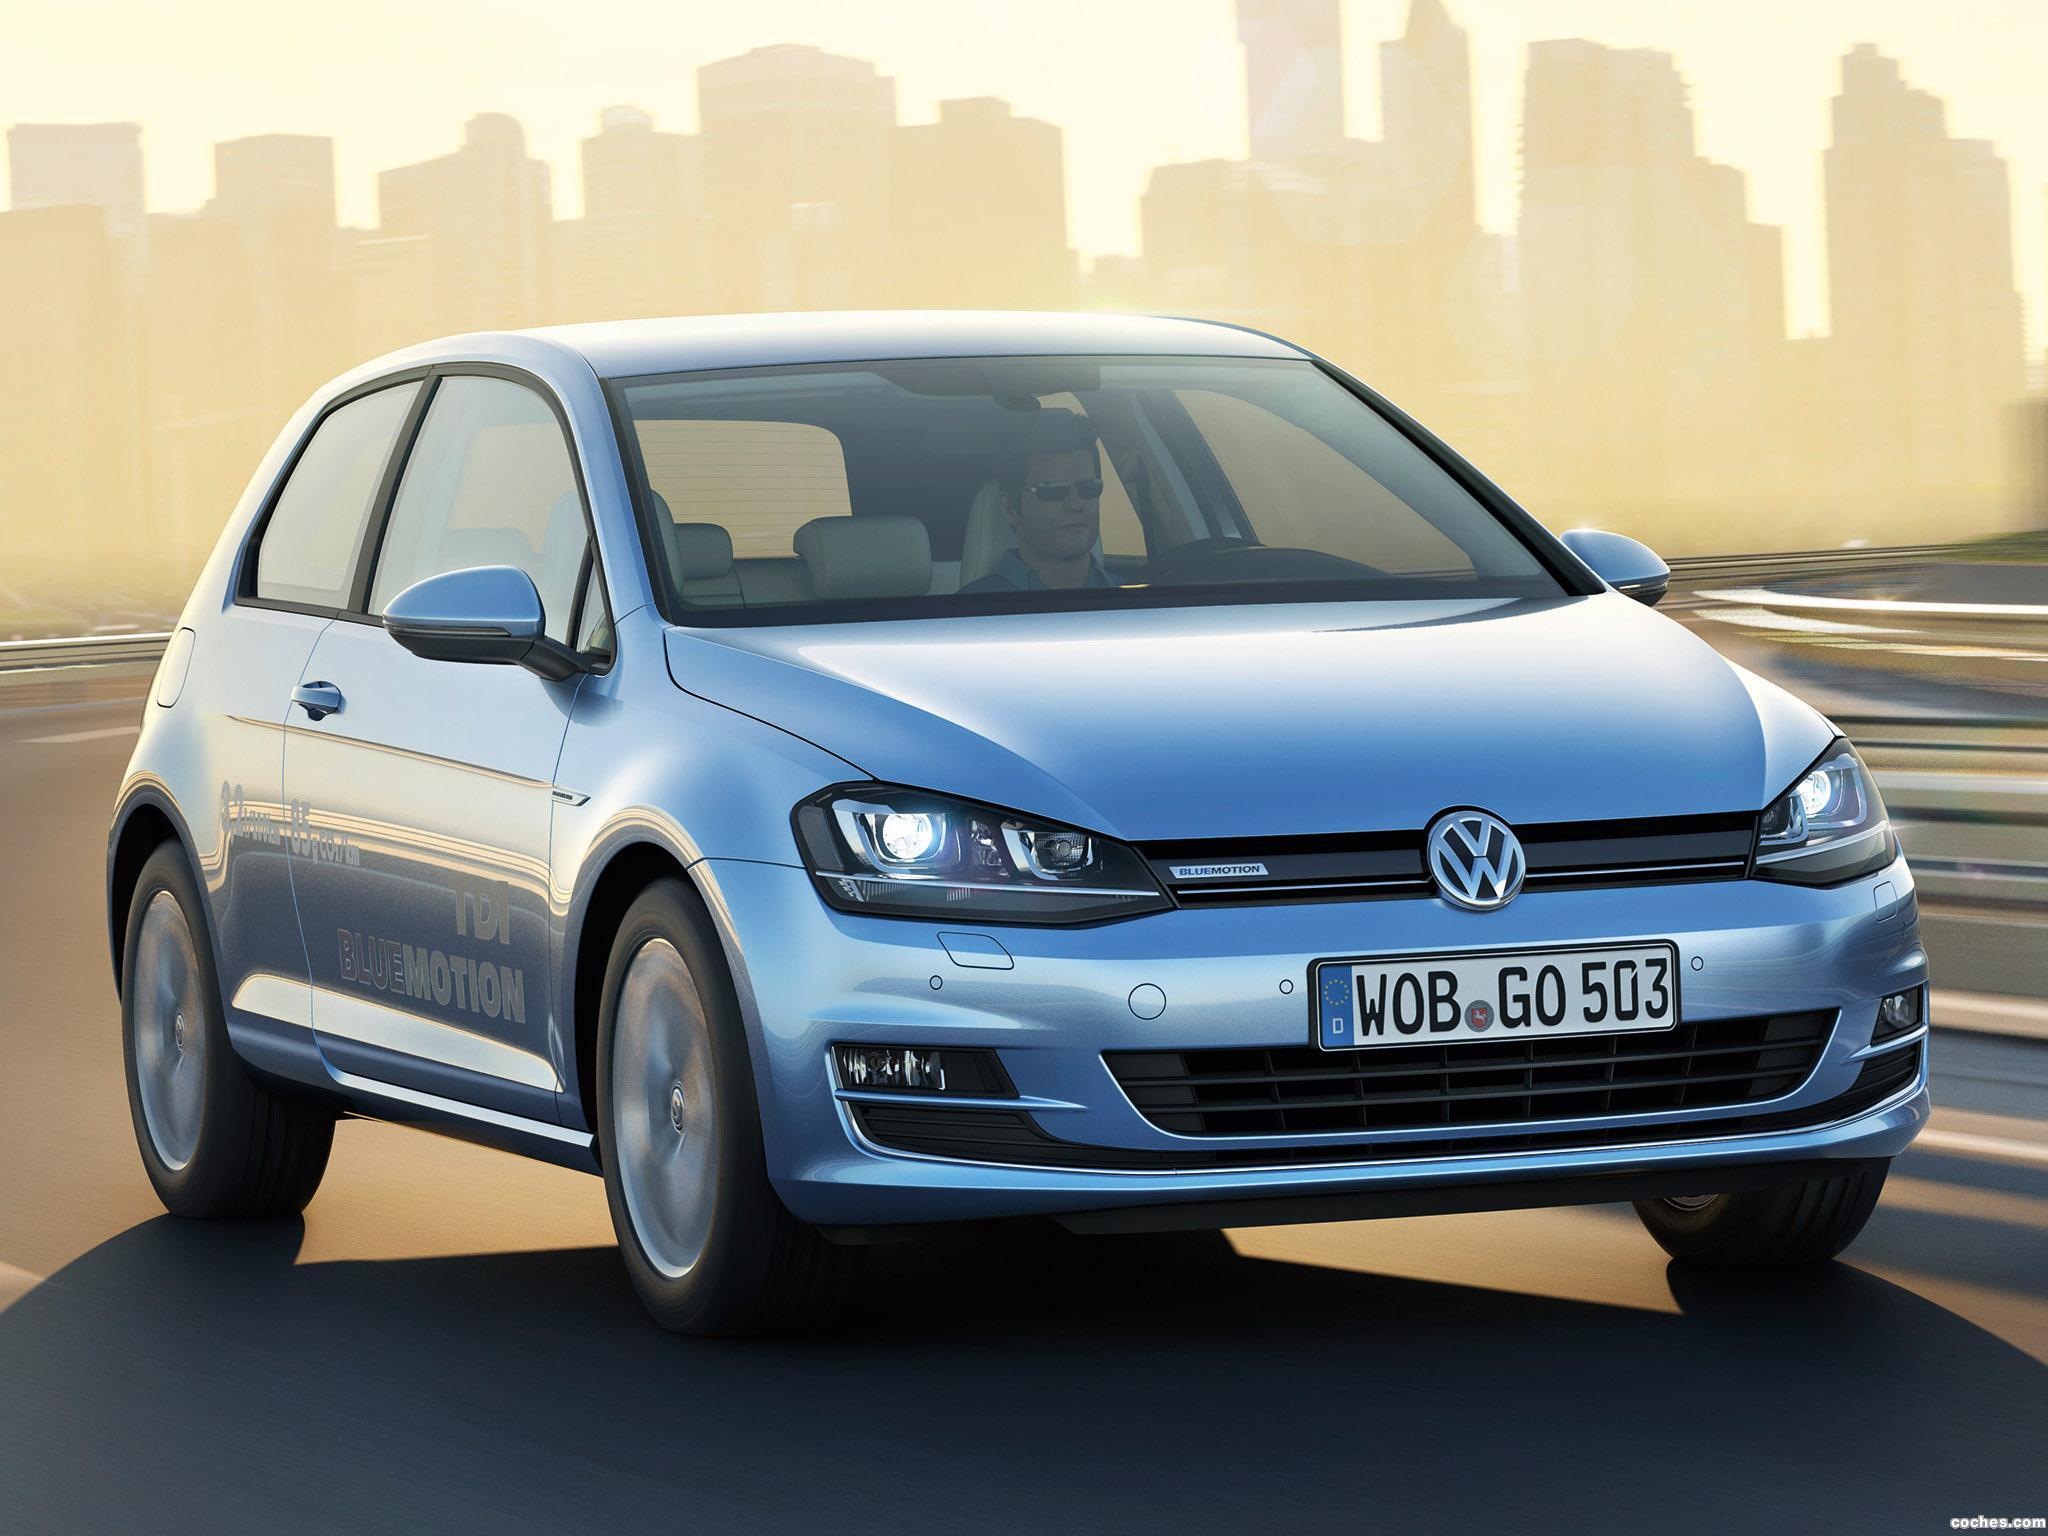 Foto 0 de Volkswagen Golf 3 puertas TGI BlueMotion 2013